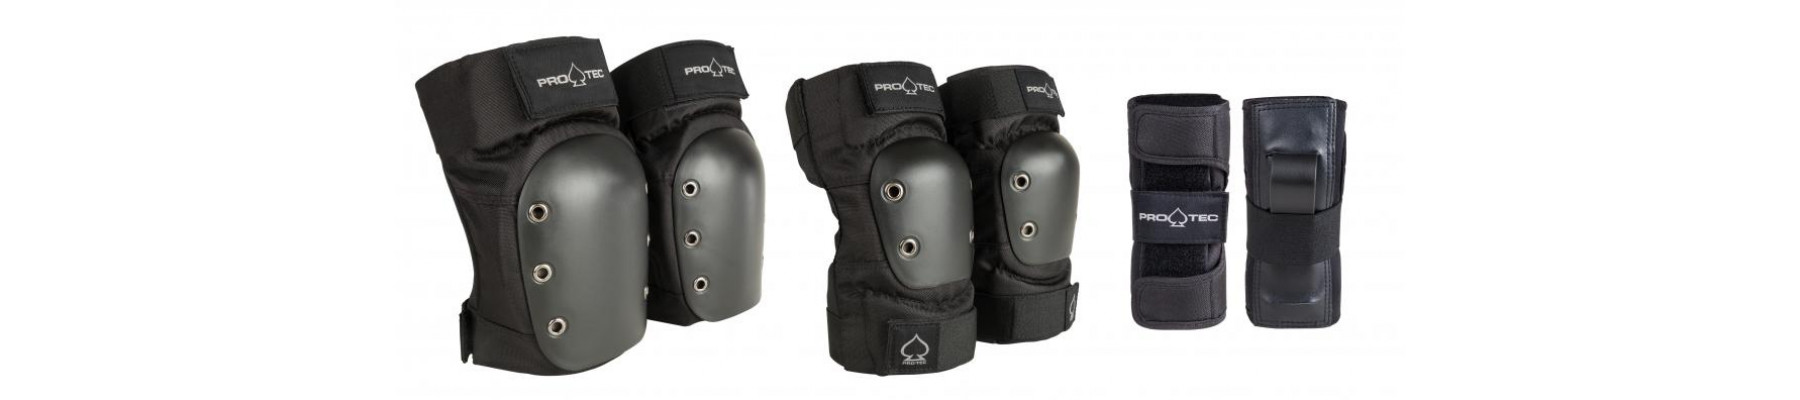 Pro-Tec Street Gear Junior 3-Pack Pad Set Black